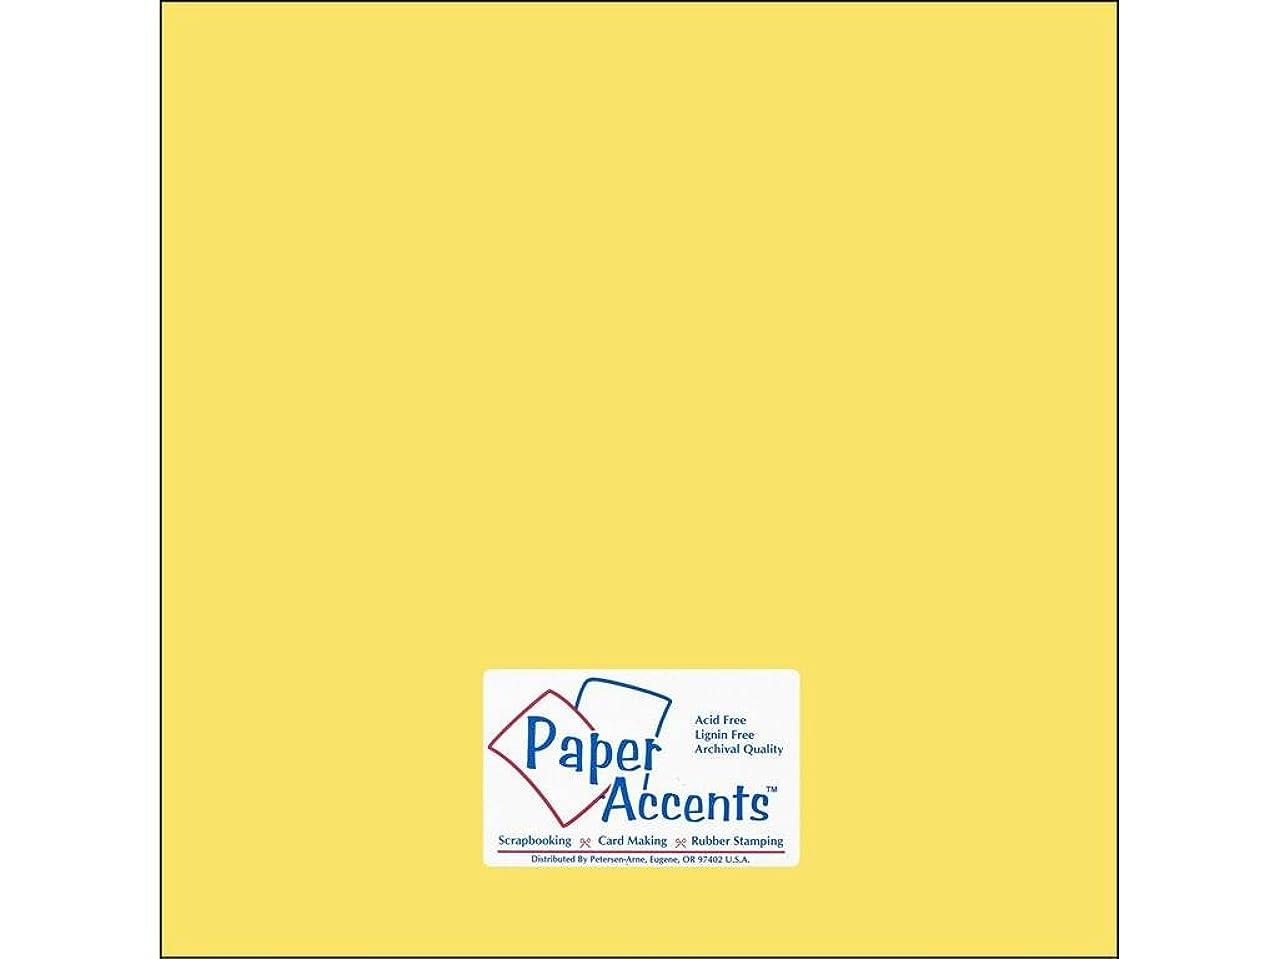 Accent Design Paper Accents ADP1212-25.10102 No.65 12